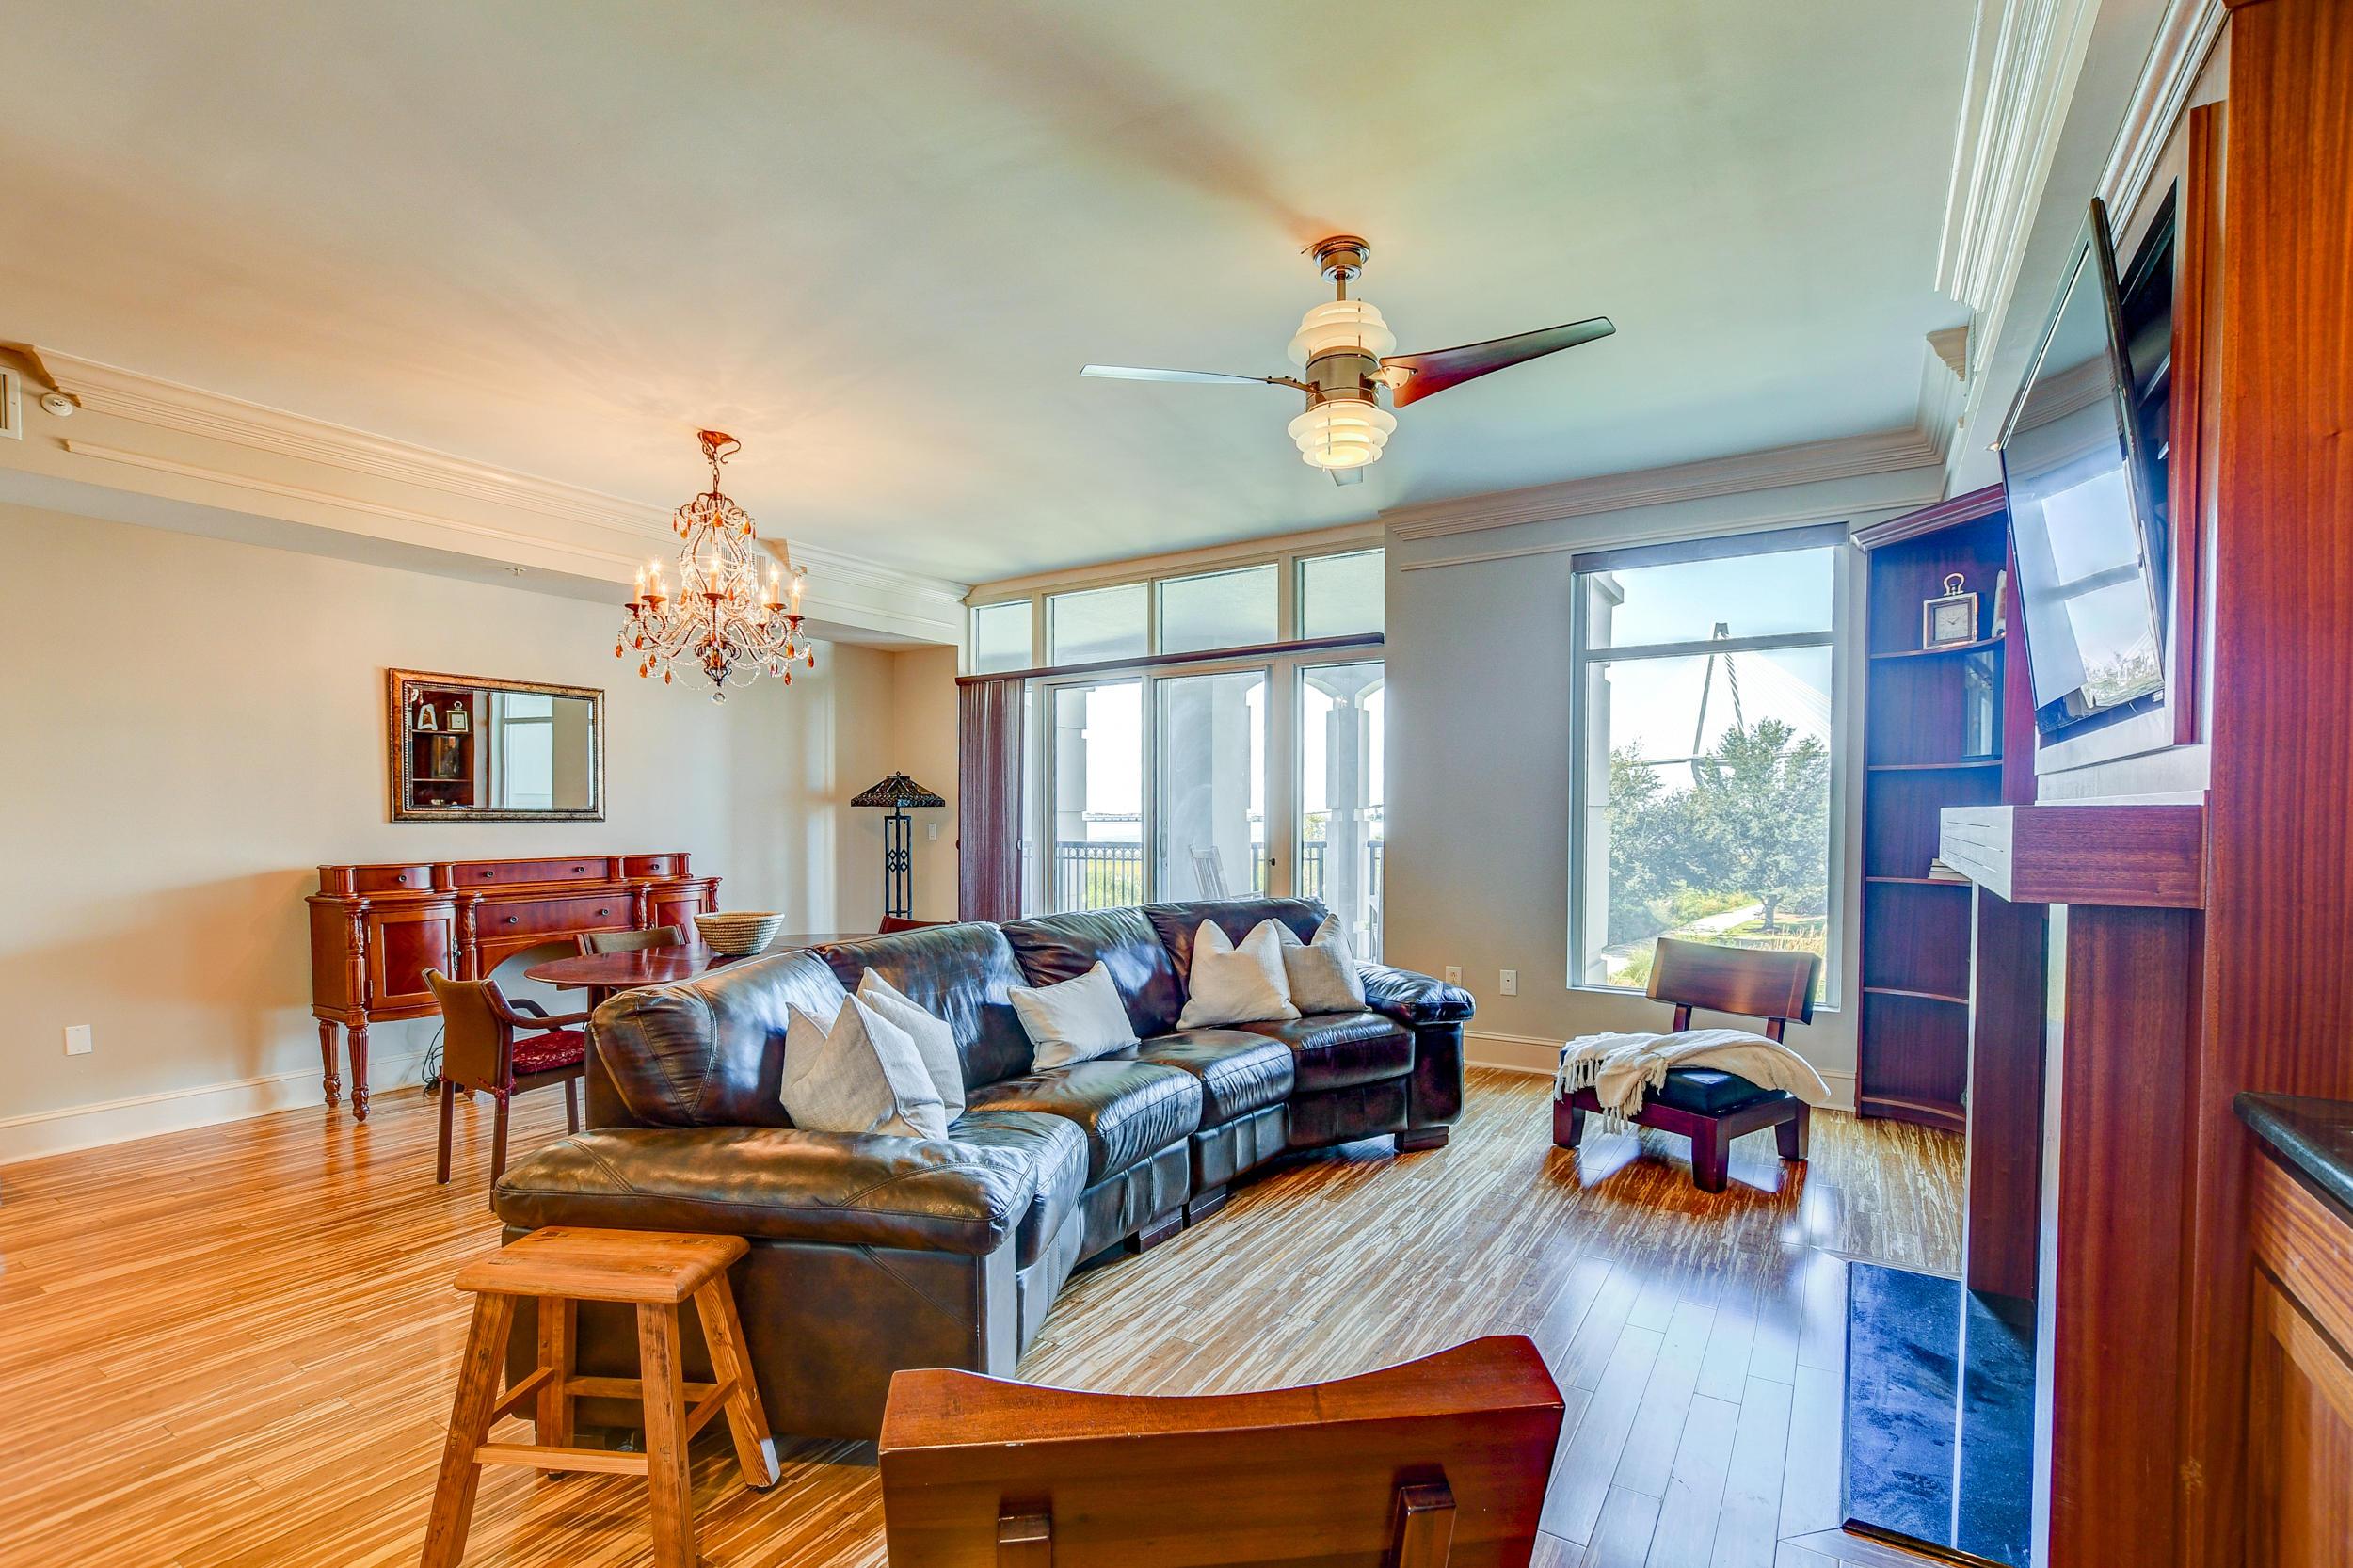 Renaissance On Chas Harbor Homes For Sale - 224 Plaza, Mount Pleasant, SC - 29